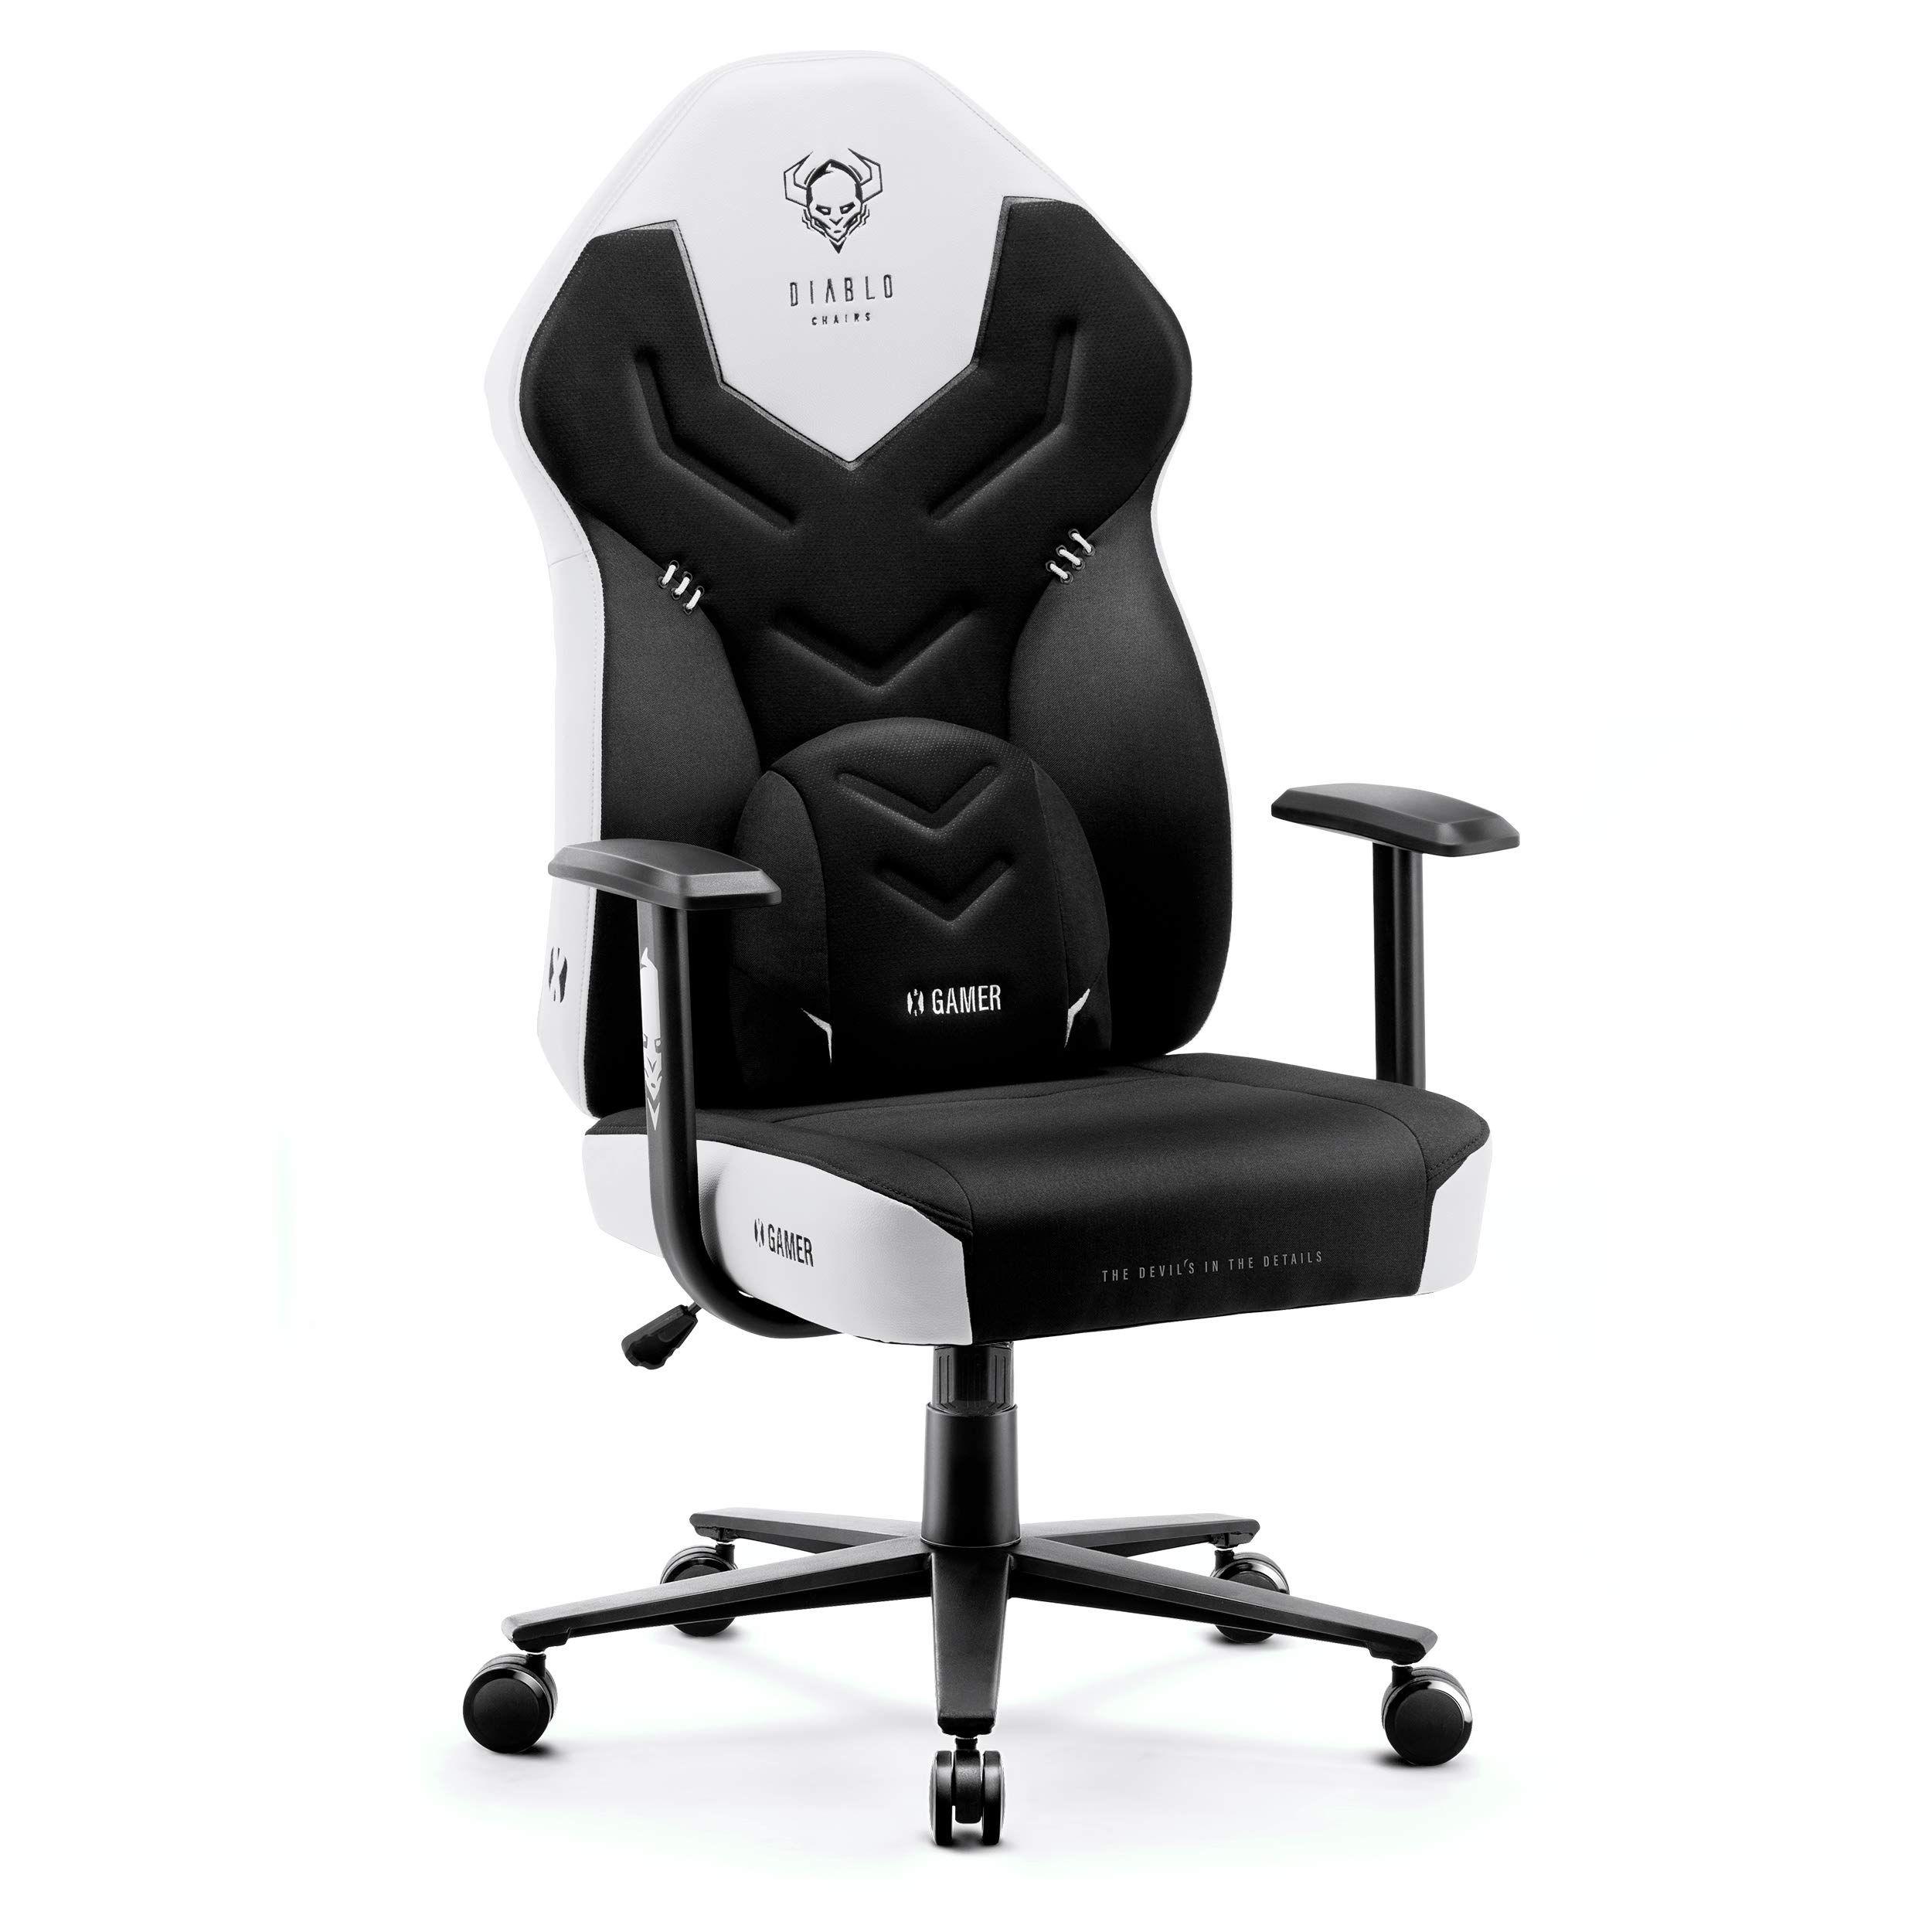 Diablo X-Gamer 2.0 Gaming Office Desk Chair Fabric Cover Ergonomic Design Lumbar Cushion Comfortable Armrests (Black-Black)